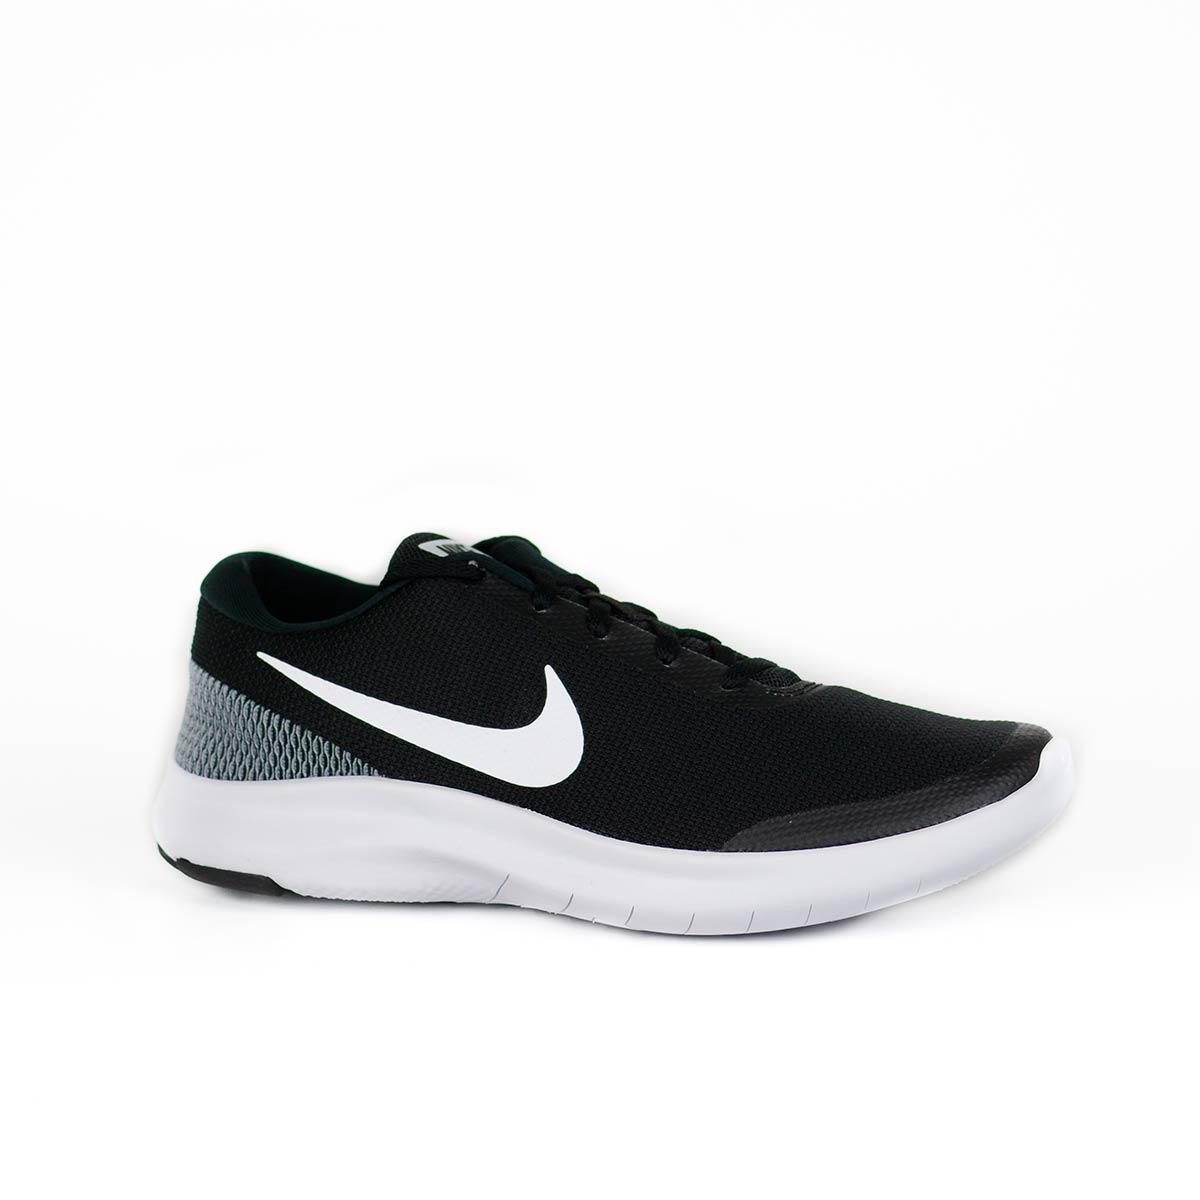 985c95bbb2fcf Nike Flex Experience RN 7 Preto Branco